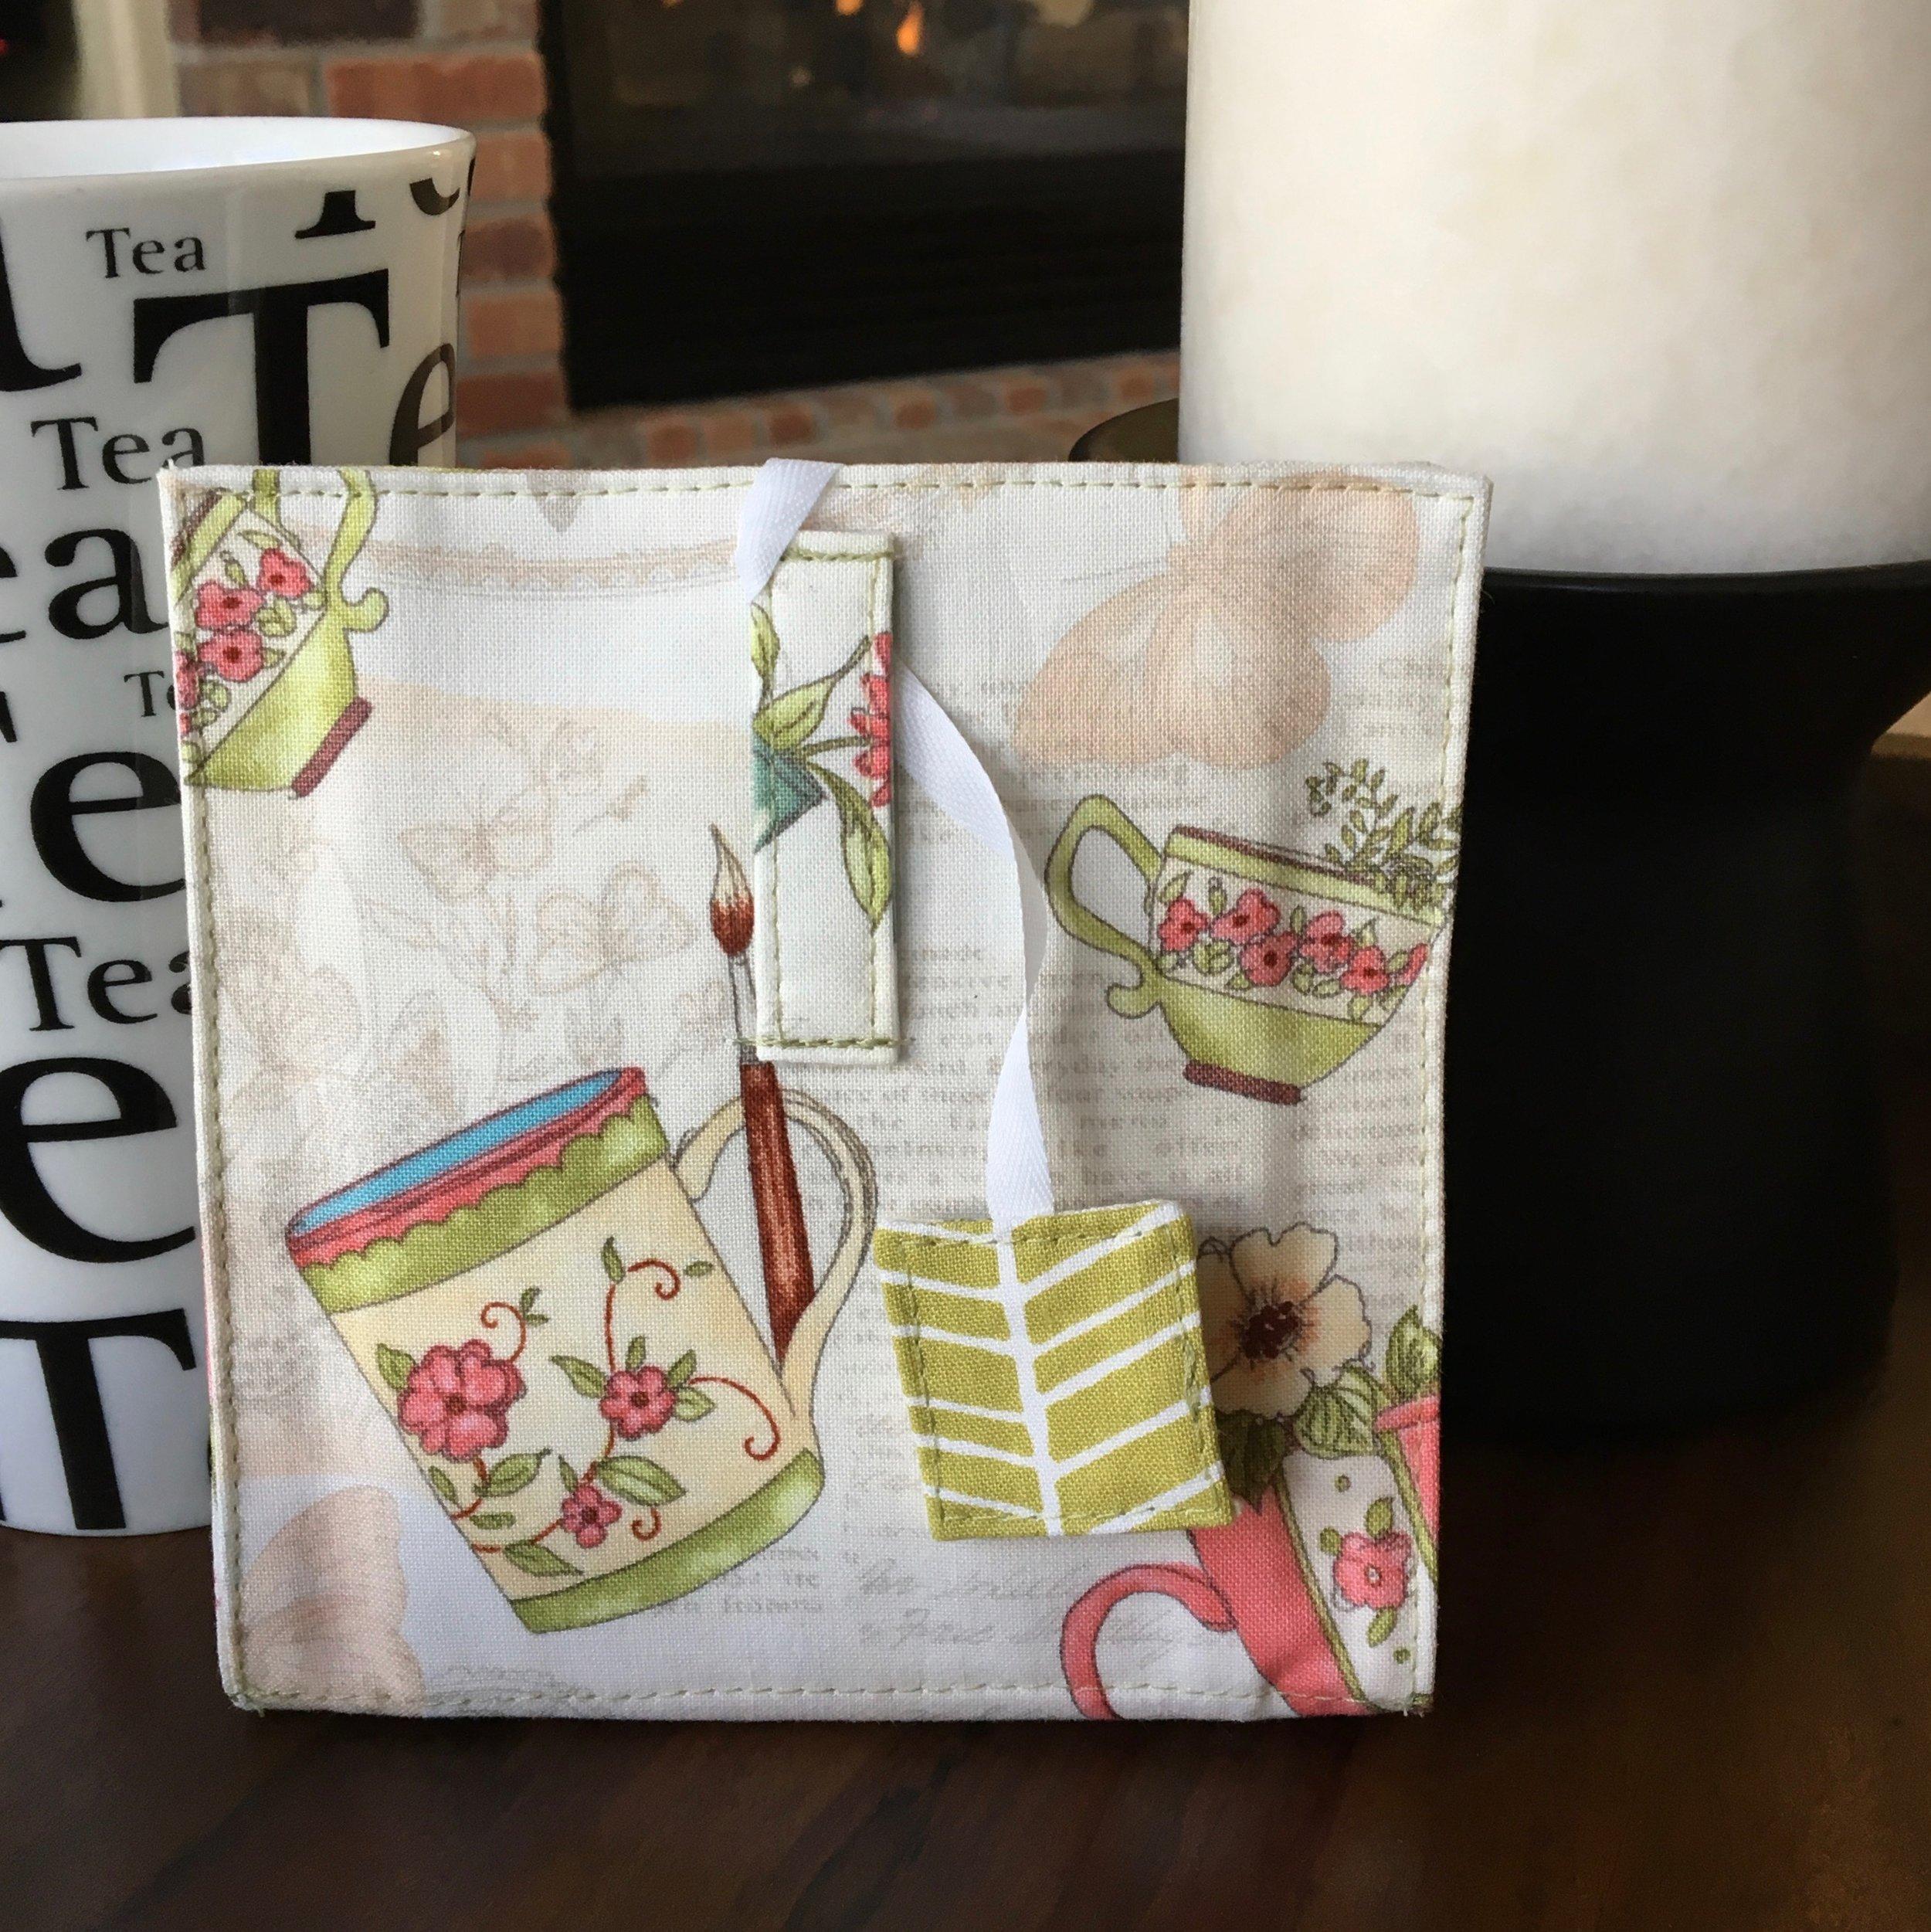 Tea Time Tea Wallet - Back